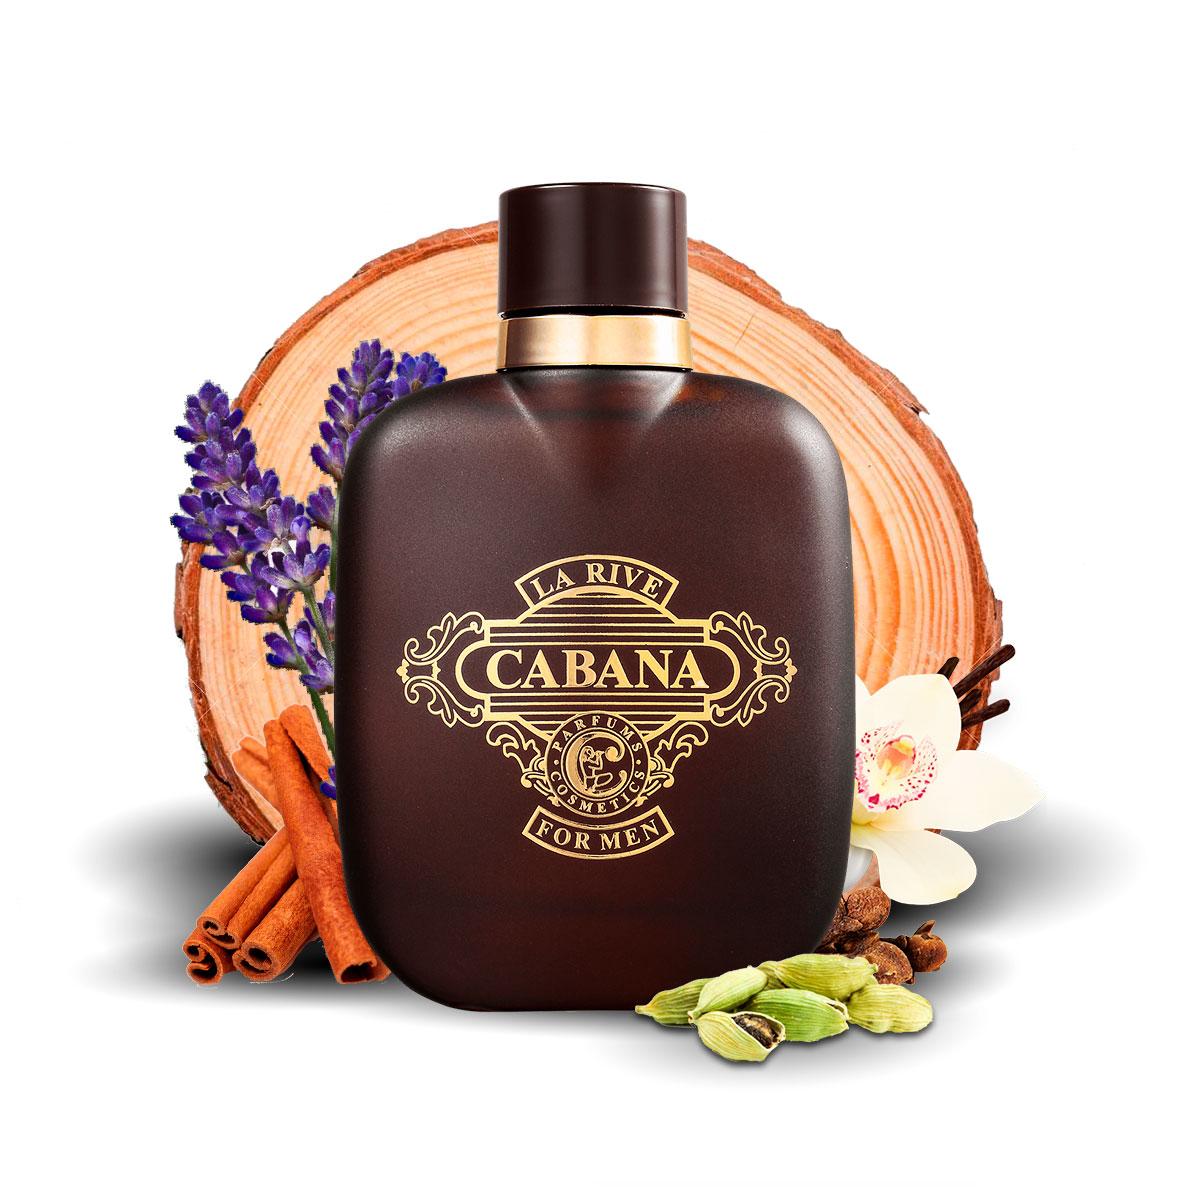 Kit 2 Perfumes Importados Extreme e Cabana La Rive  - Mercari Perfumes